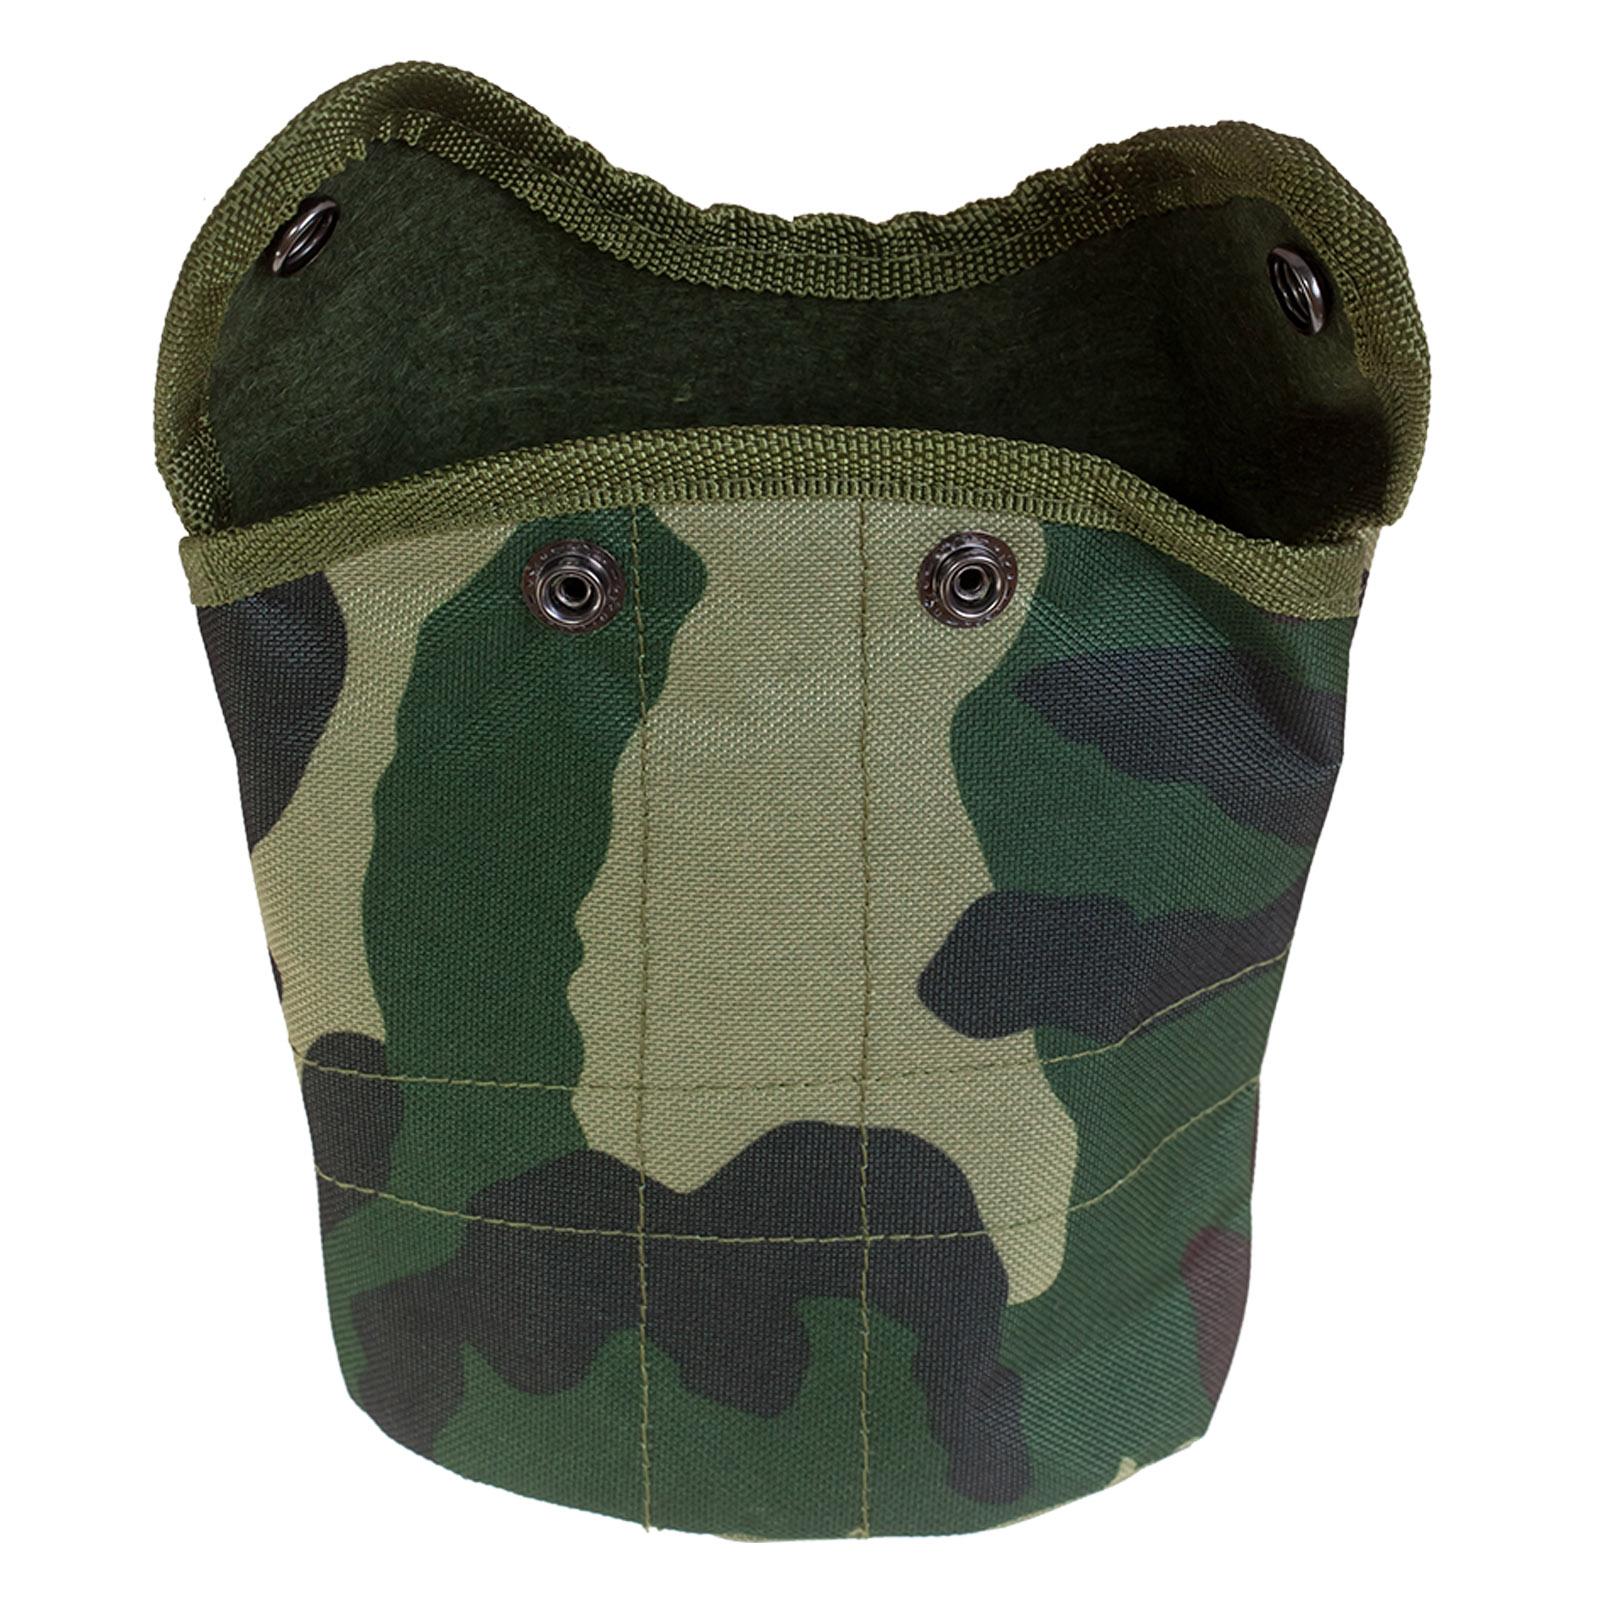 Армейские фляги с подсумками от интернет магазина Военпро